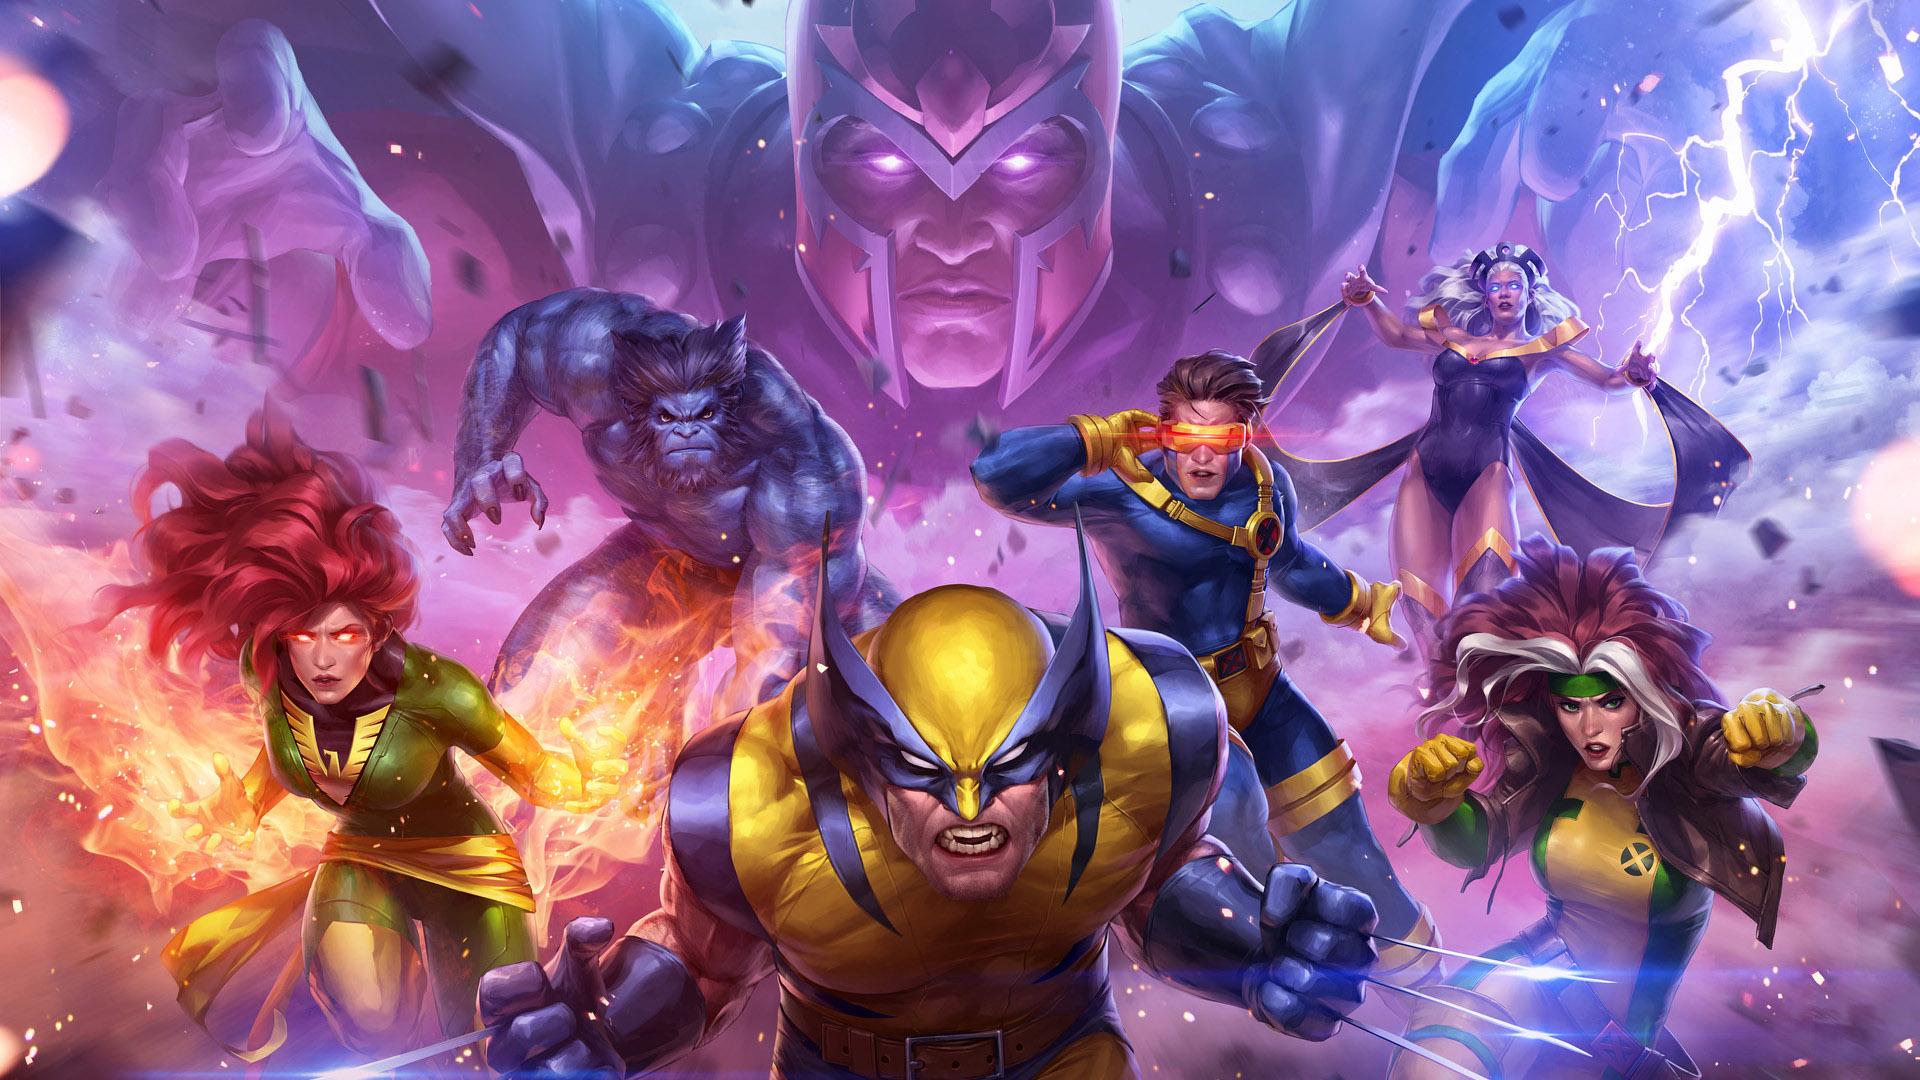 Wallpaper X-Men team, superhero, wolverine